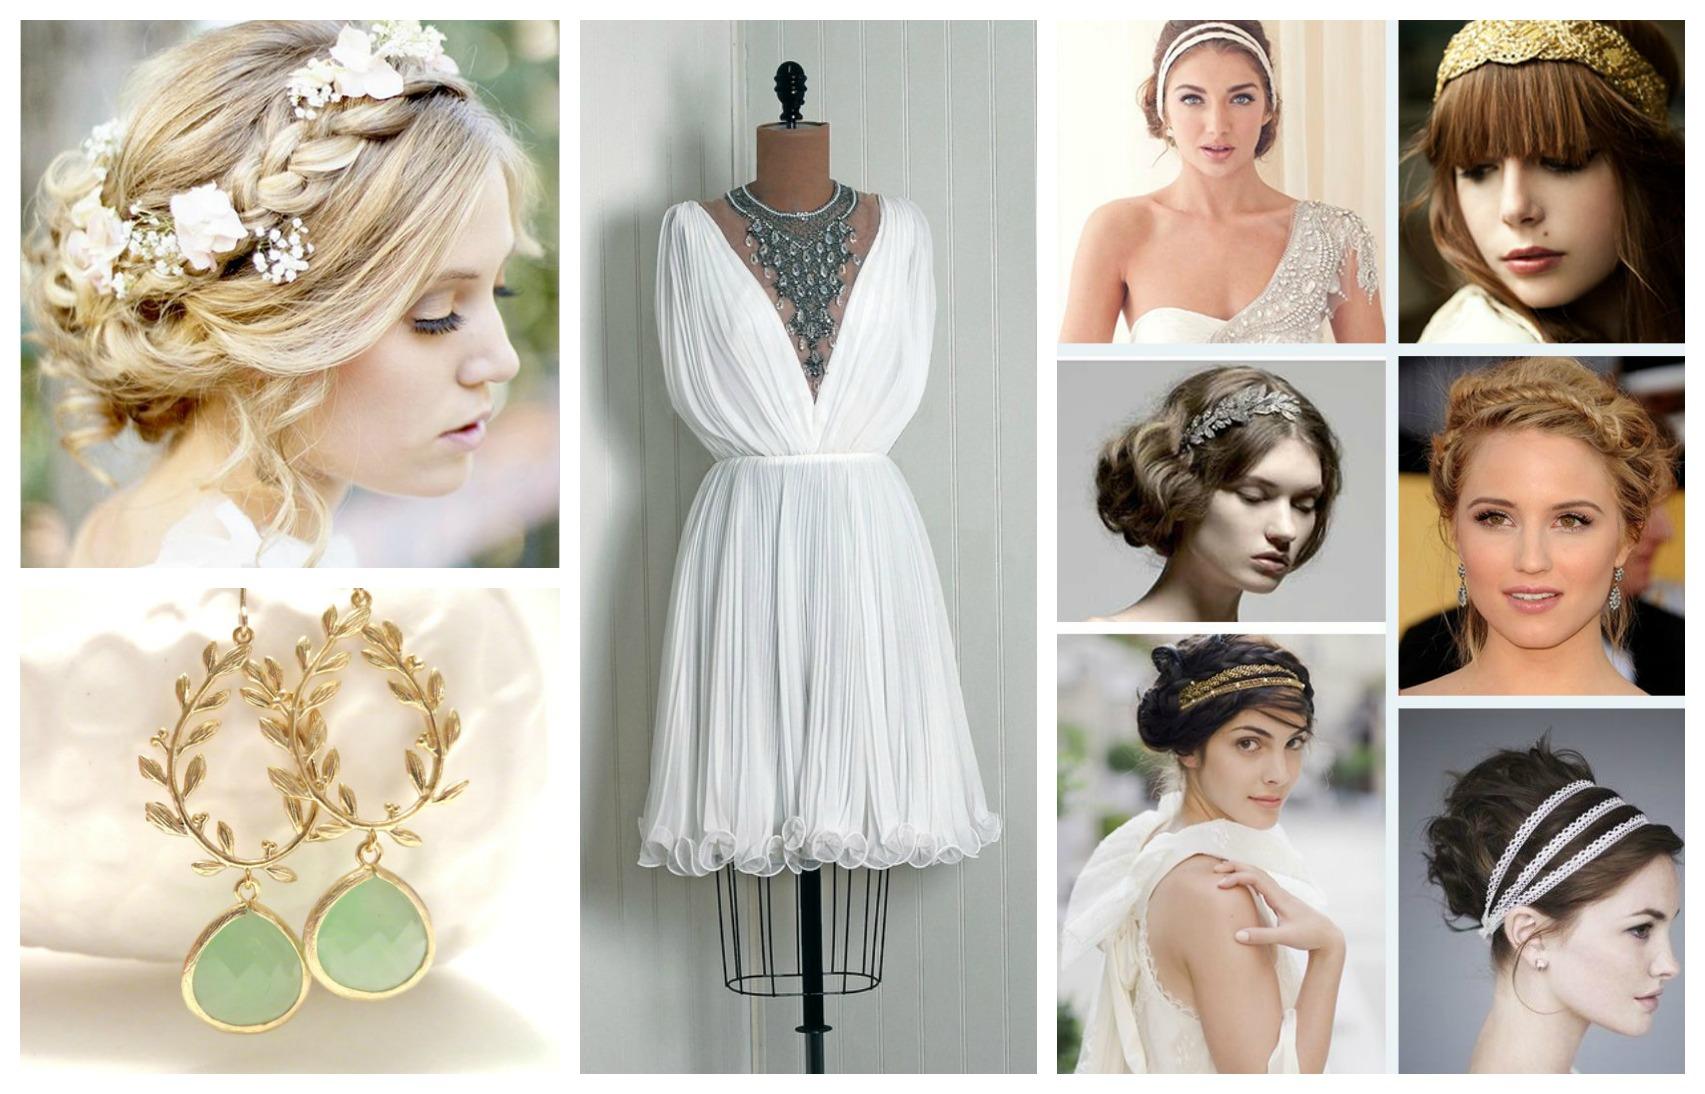 Фото невеста в греческом стиле